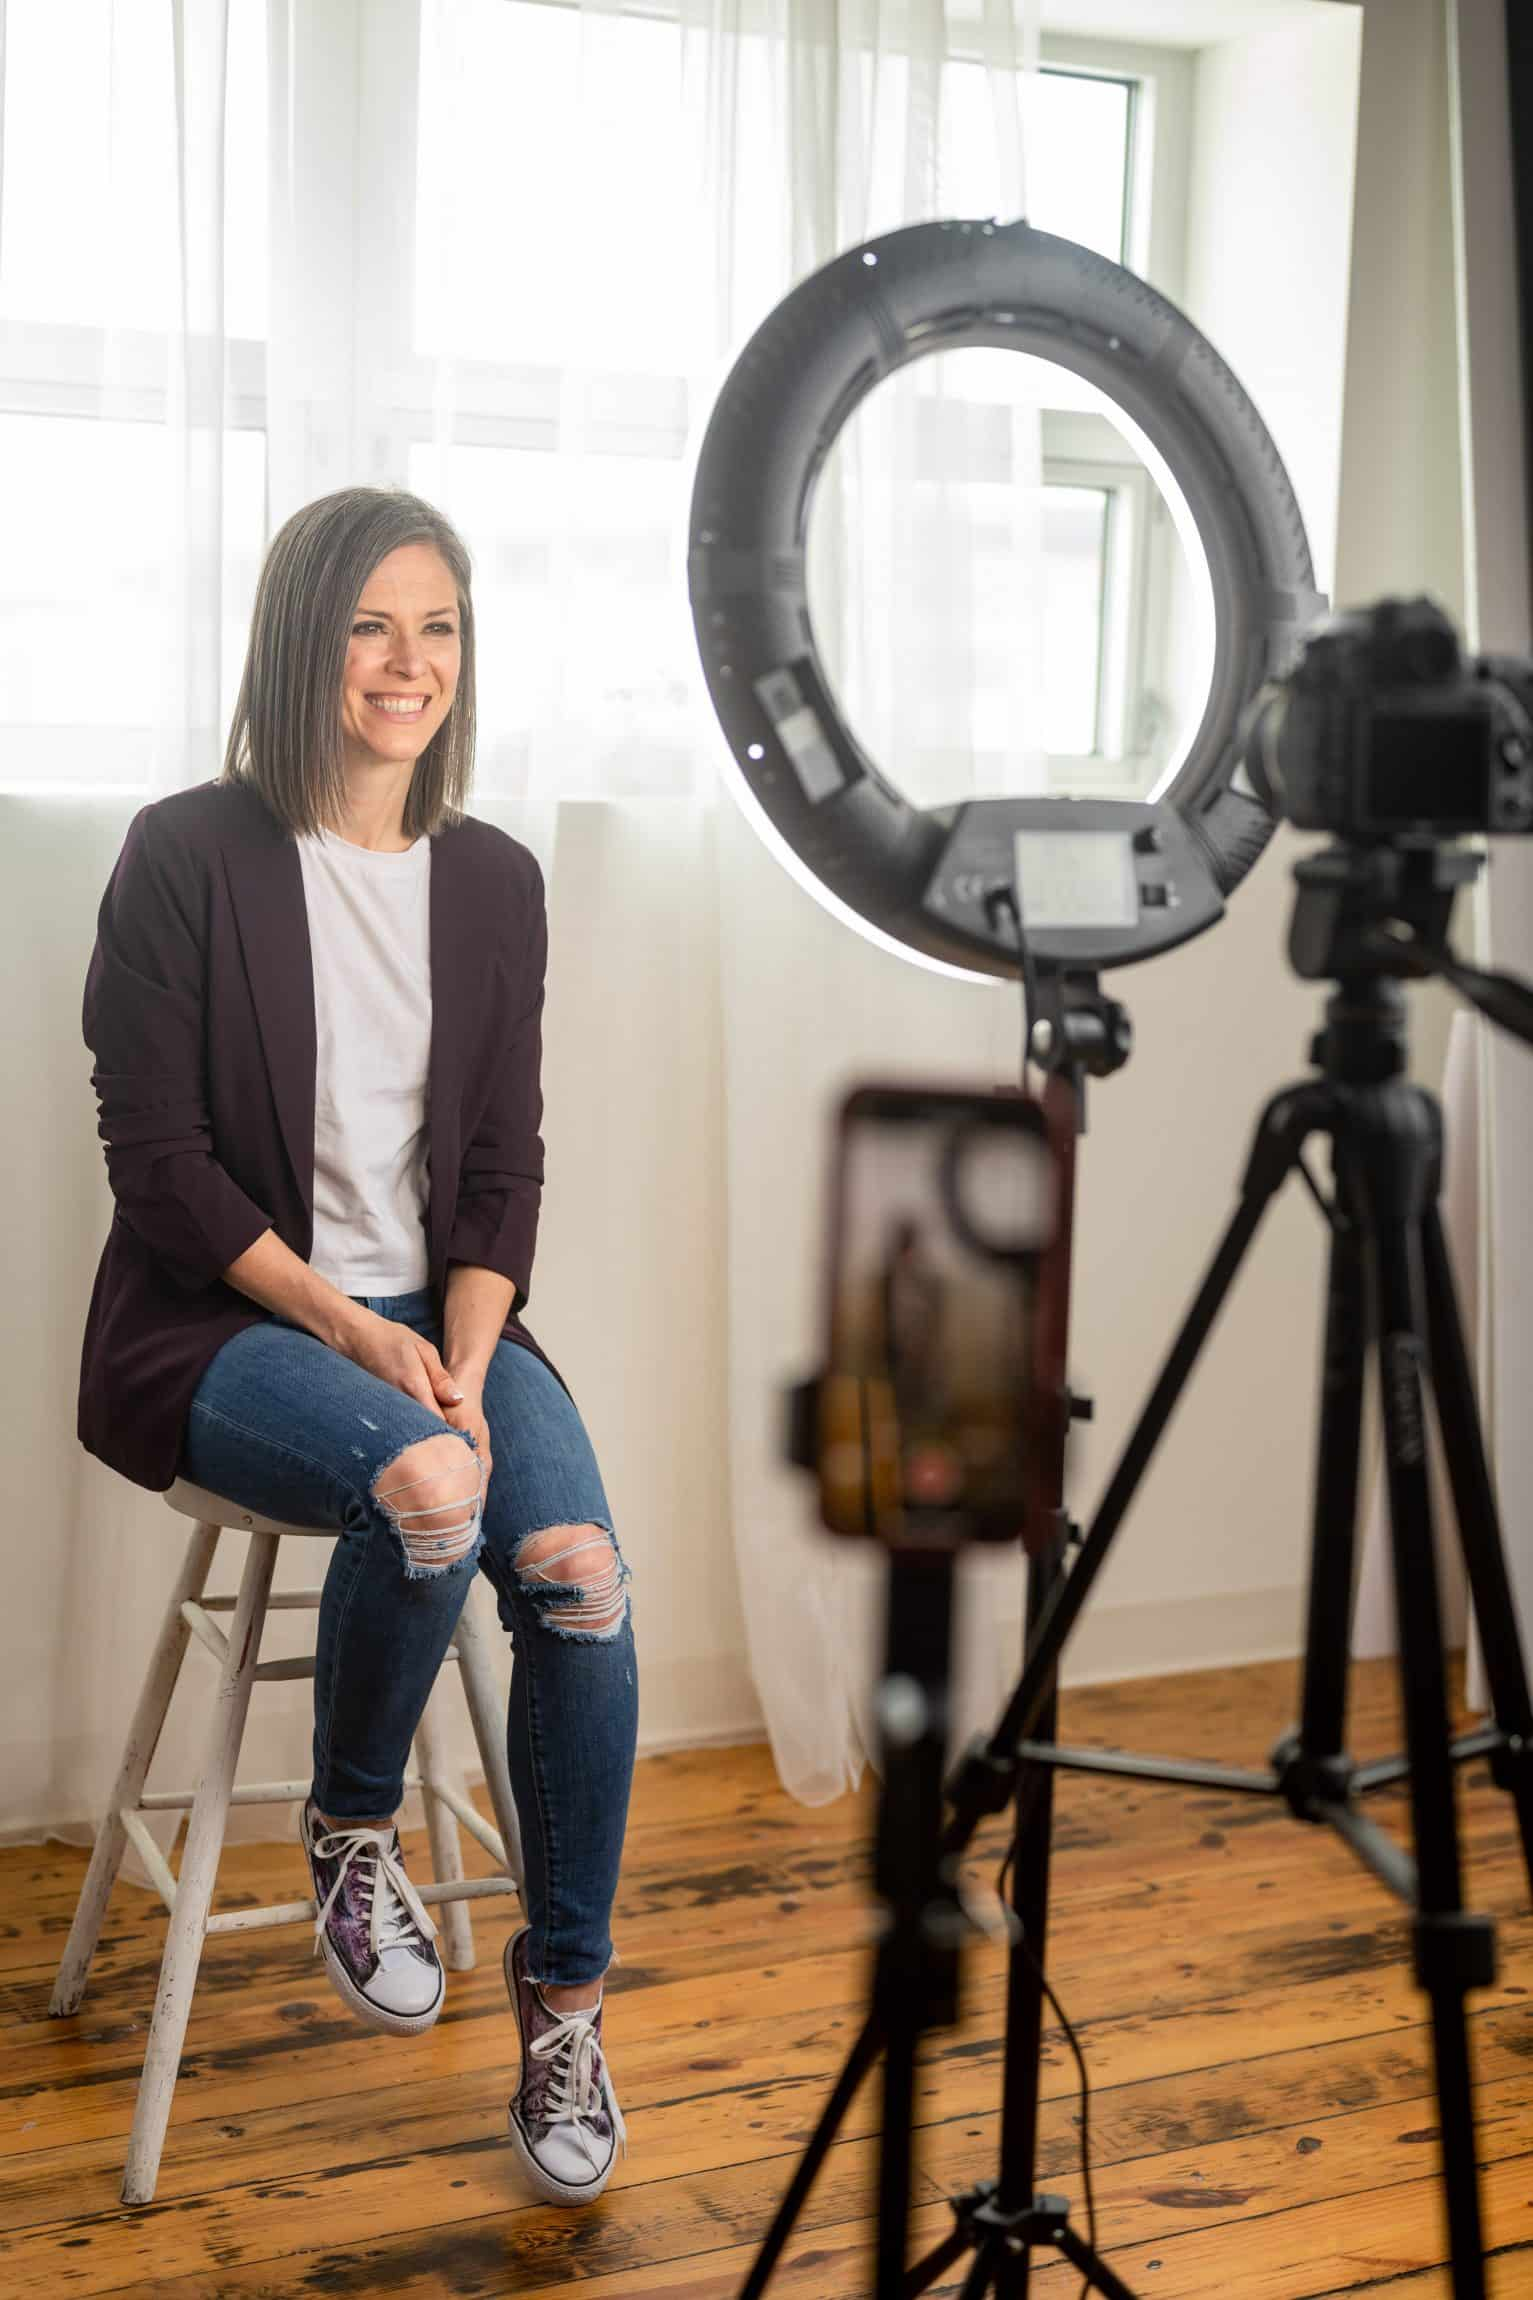 personal branding photo experience